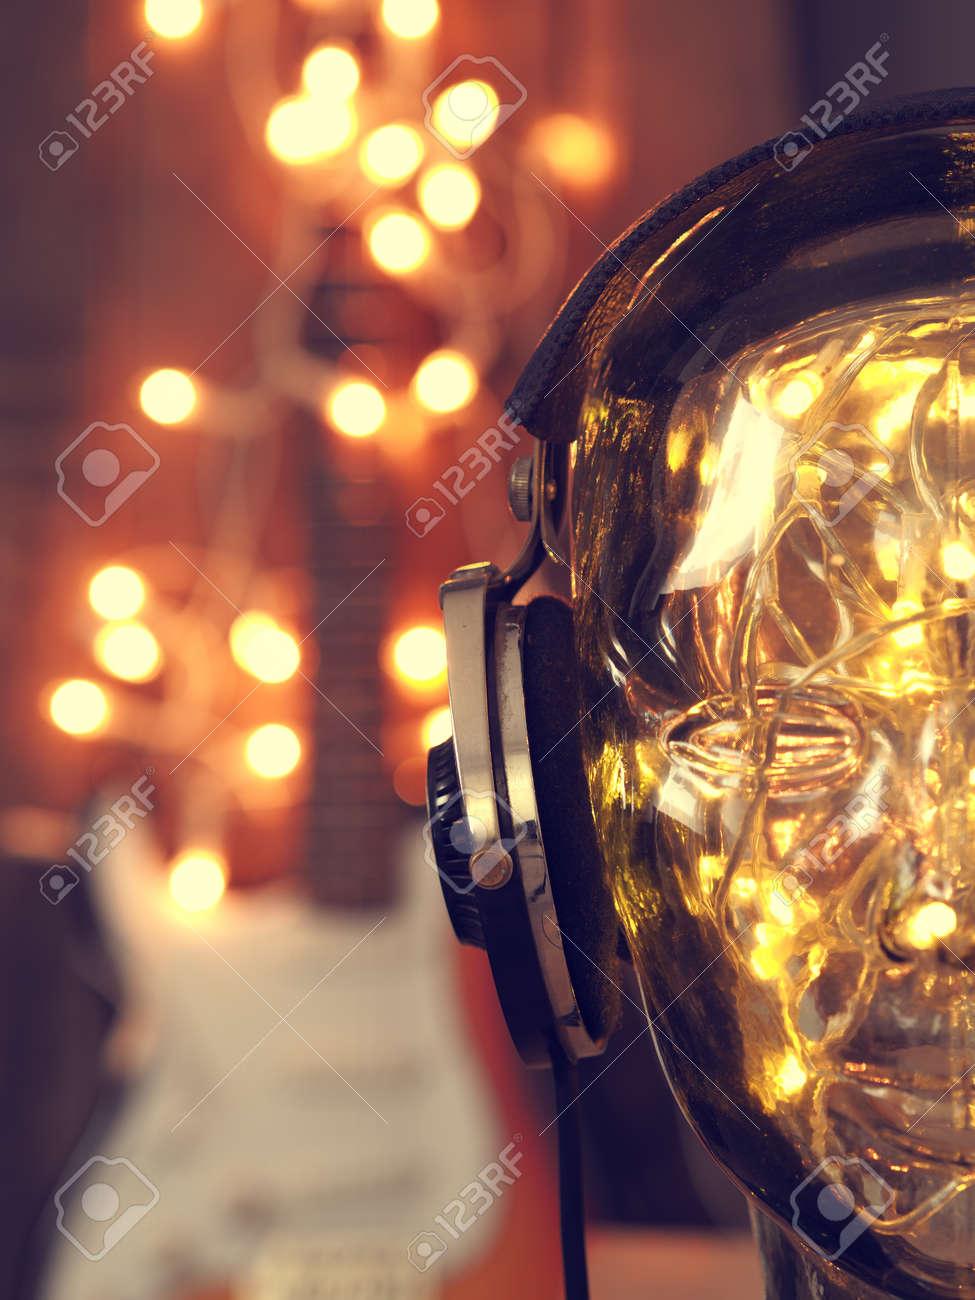 Rock Christmas Music.Headphones On A Glass Head With Christmas Lights Christmas Music